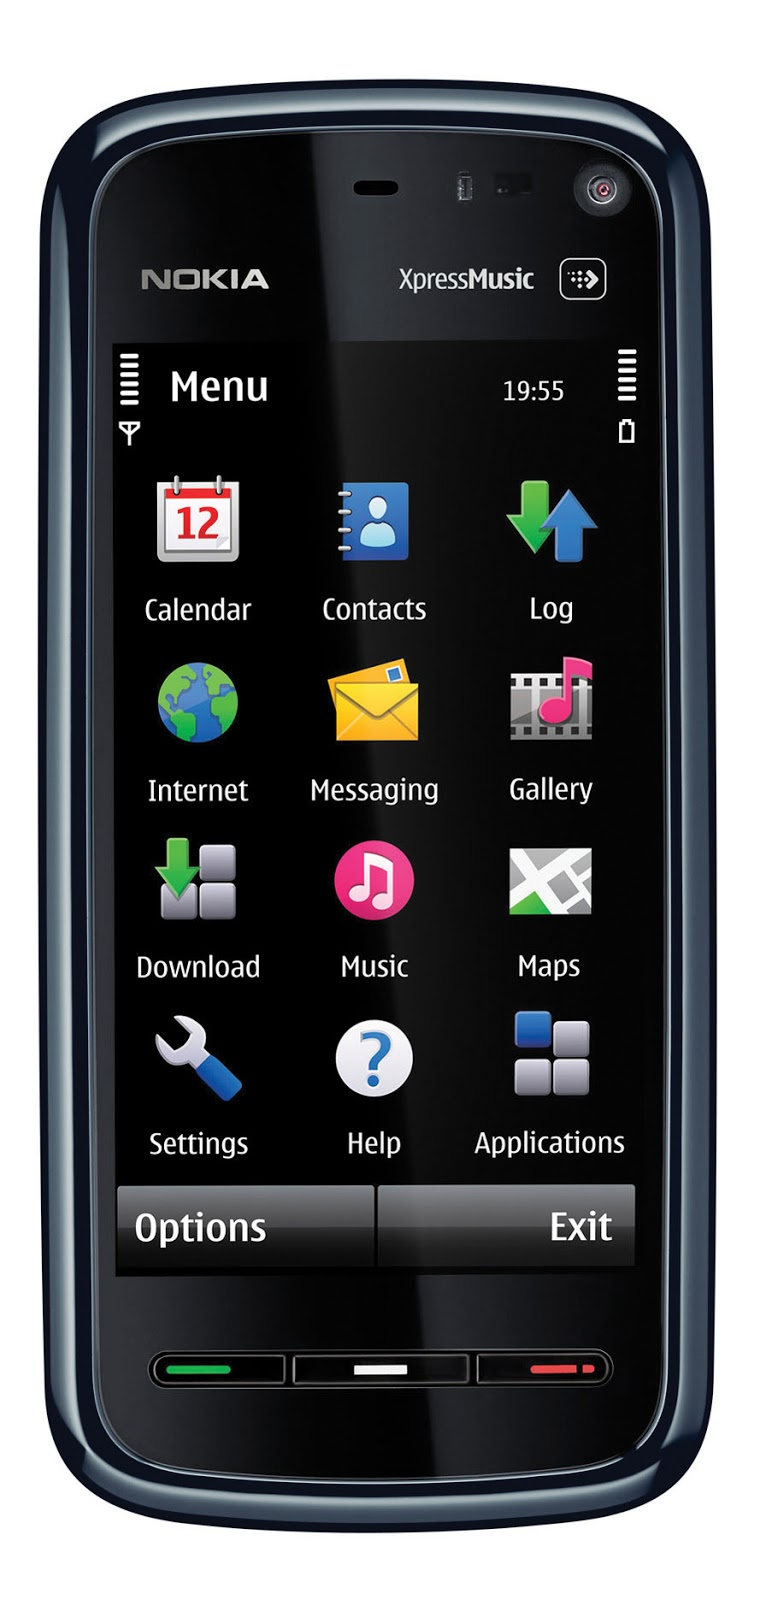 windows 7 5 in ur 5800 xpress music rh techinicalhacks blogspot com Nokia 6600 Nokia 5310